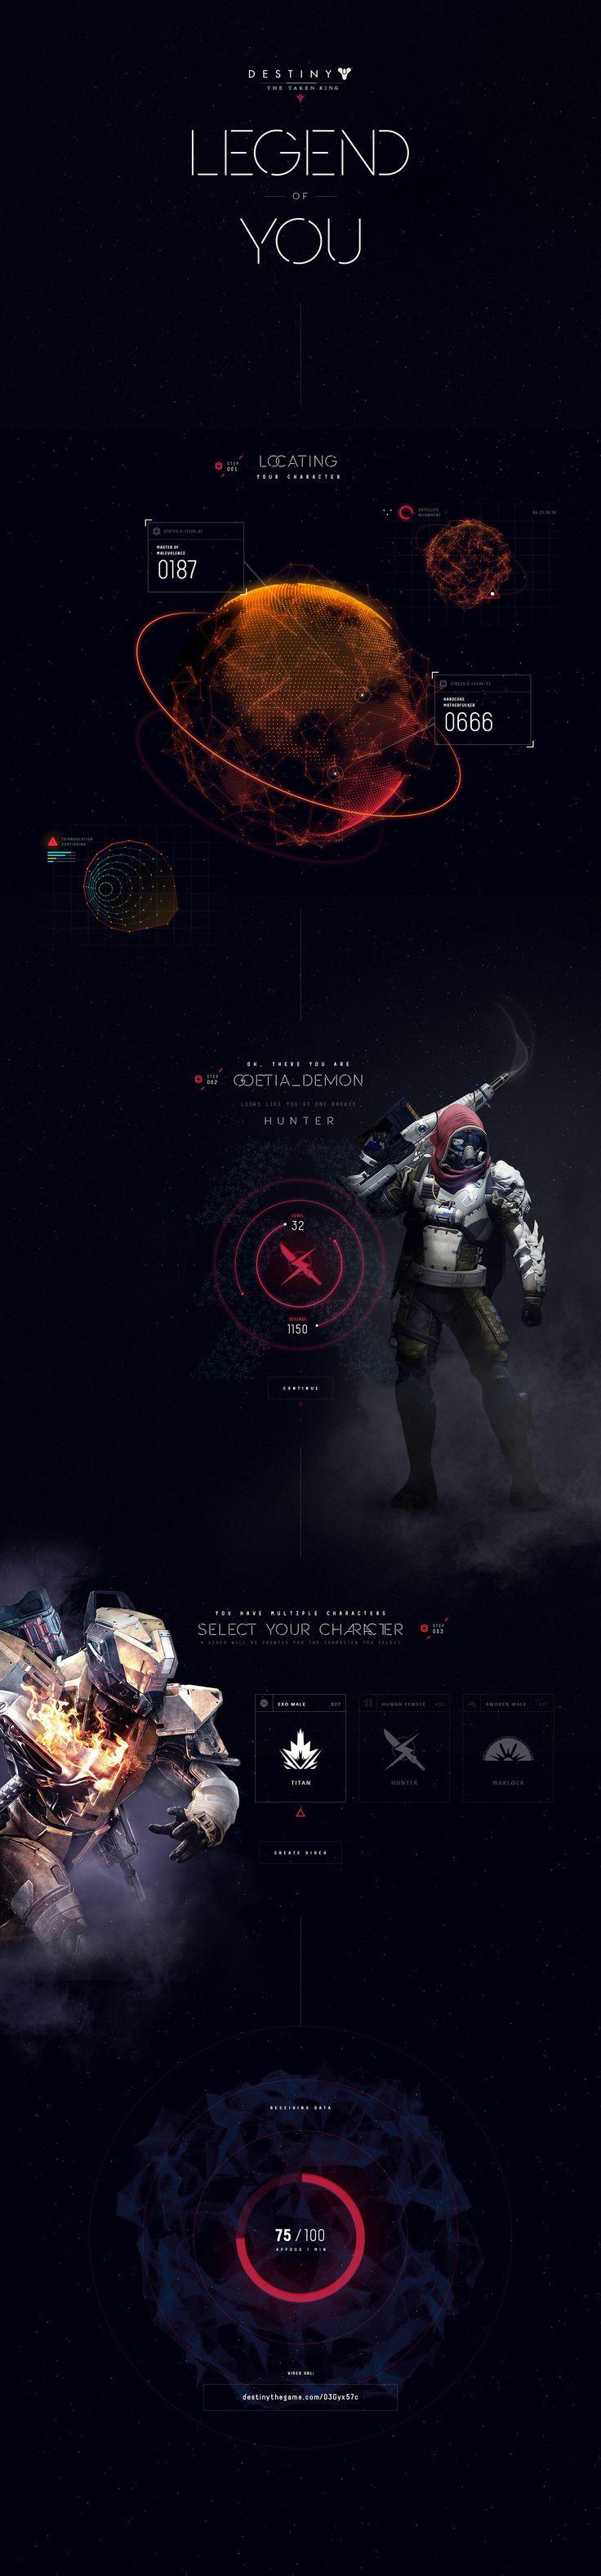 Destiny Legend of You on Behance